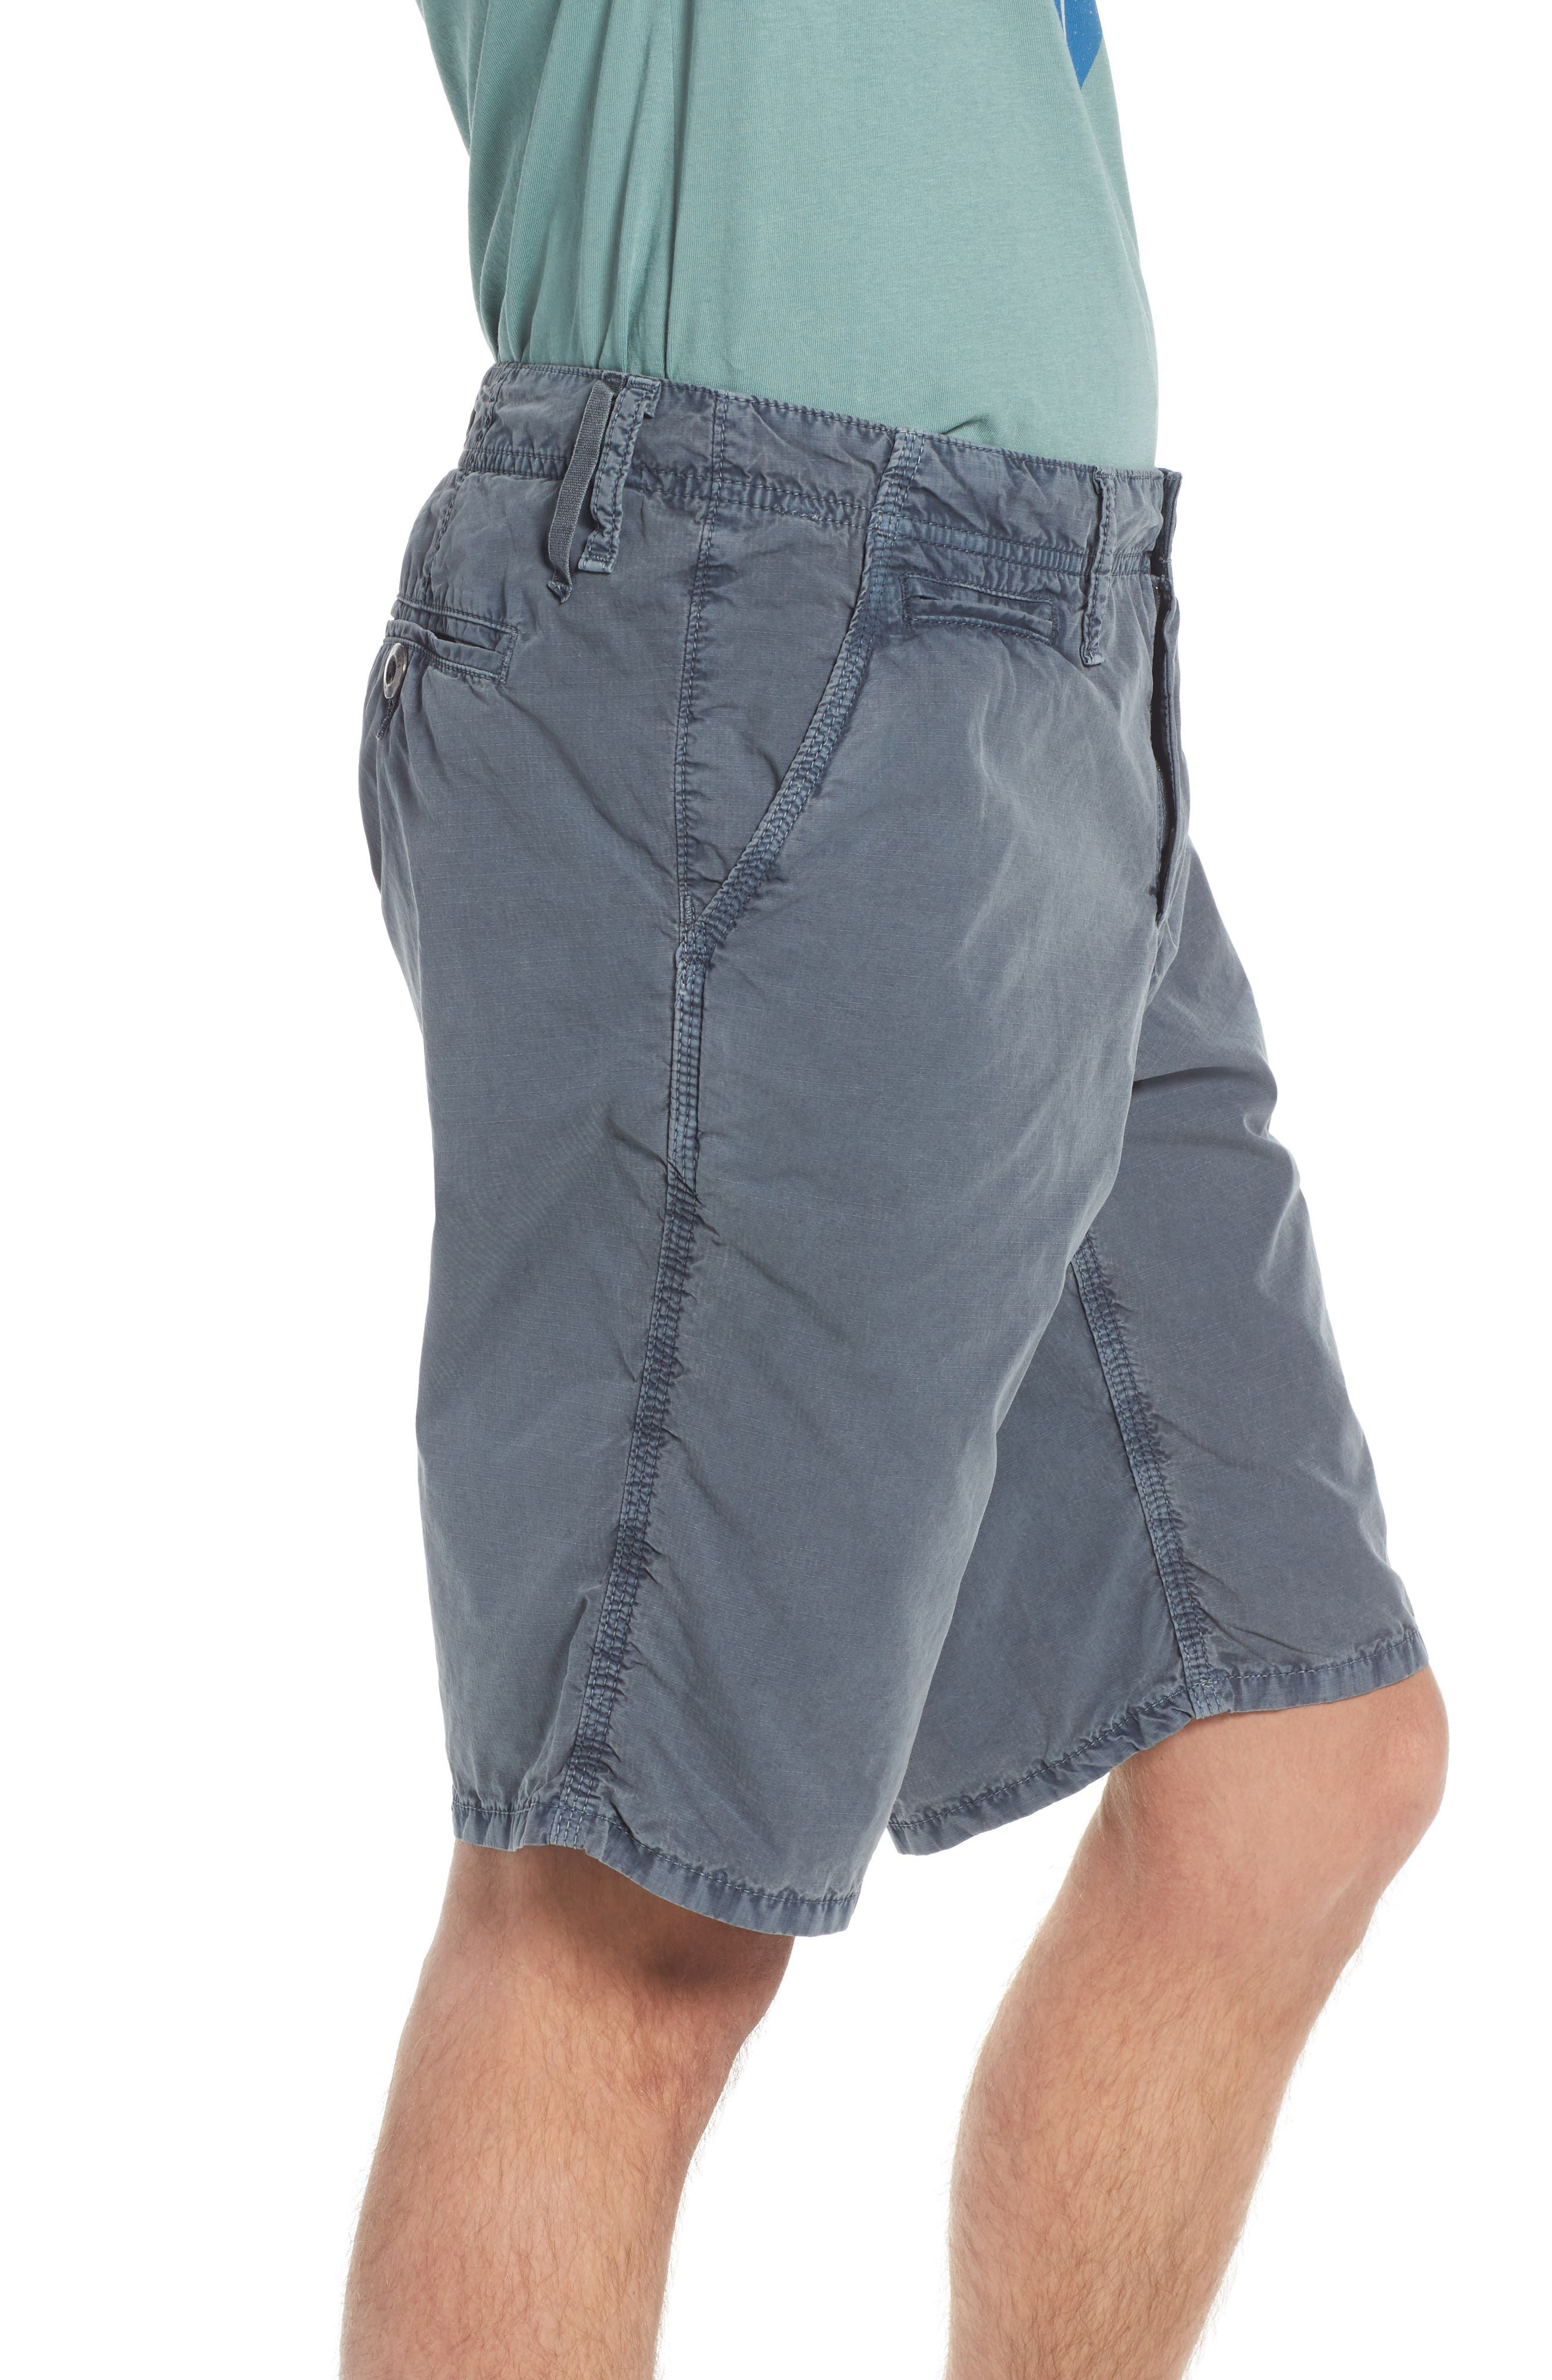 Palm Springs Shorts,                             Alternate thumbnail 13, color,